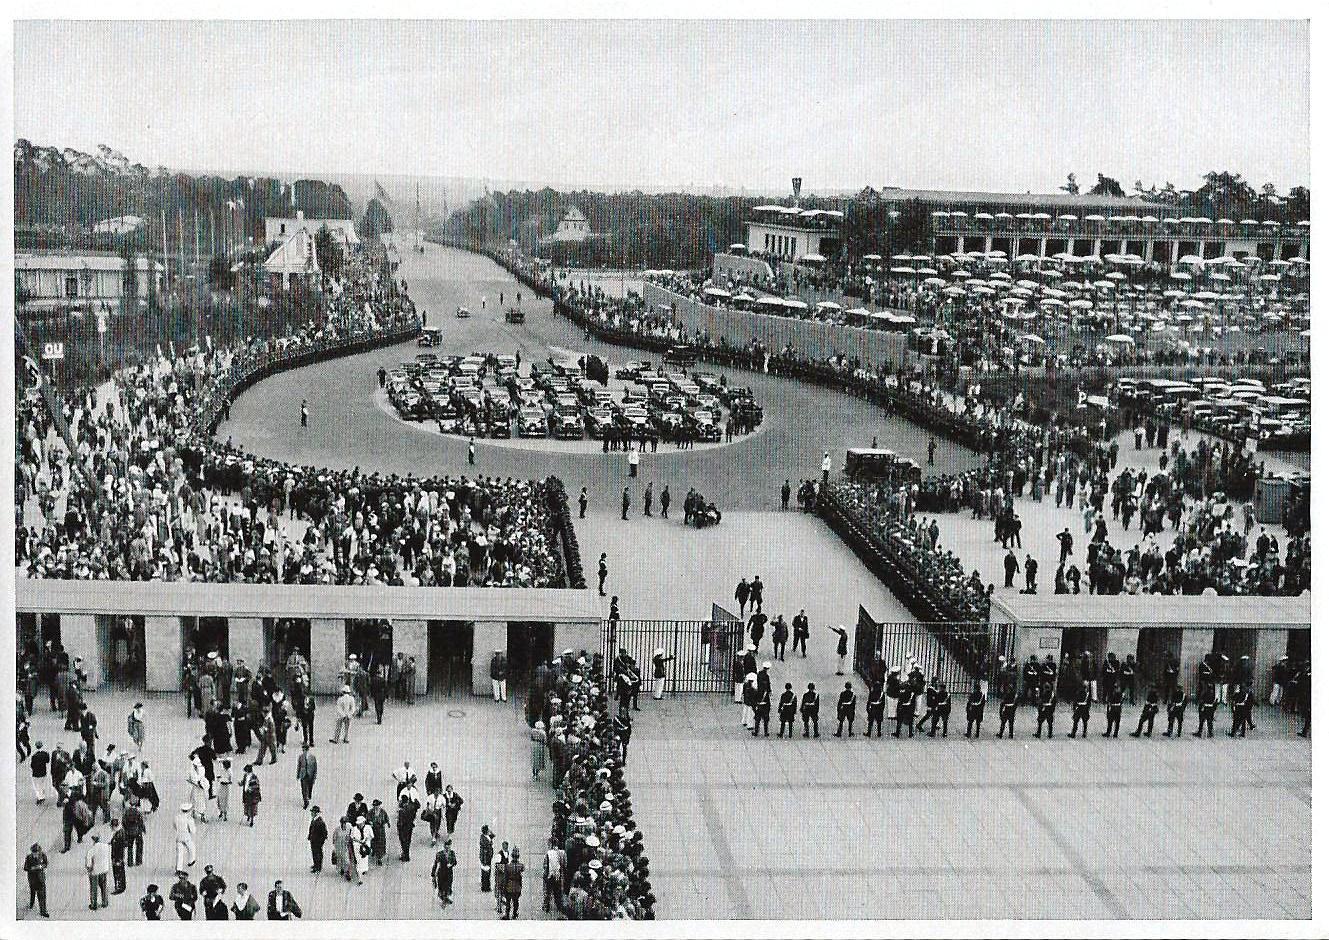 1936 Olympics Photographs - Sammelwerk Nr. 14, Bild Nr. 13, Gruppe 59, Adolf Hilter Enters the South Gate of Olympics Stadium on August 2, 1936